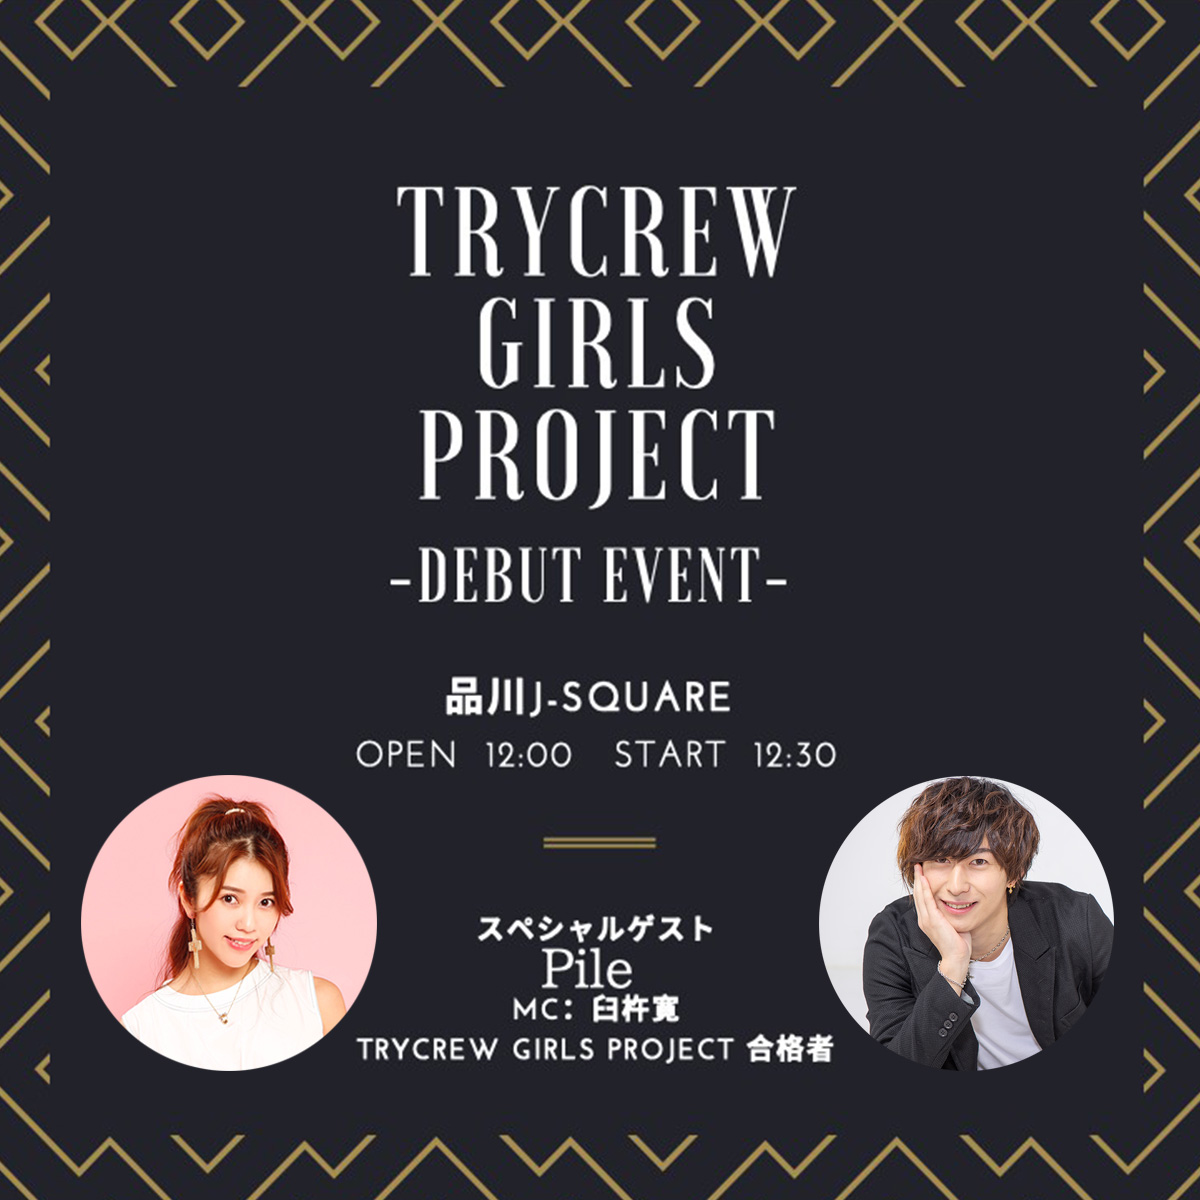 TRYCREW GIRLS PROJECT デビューイベント